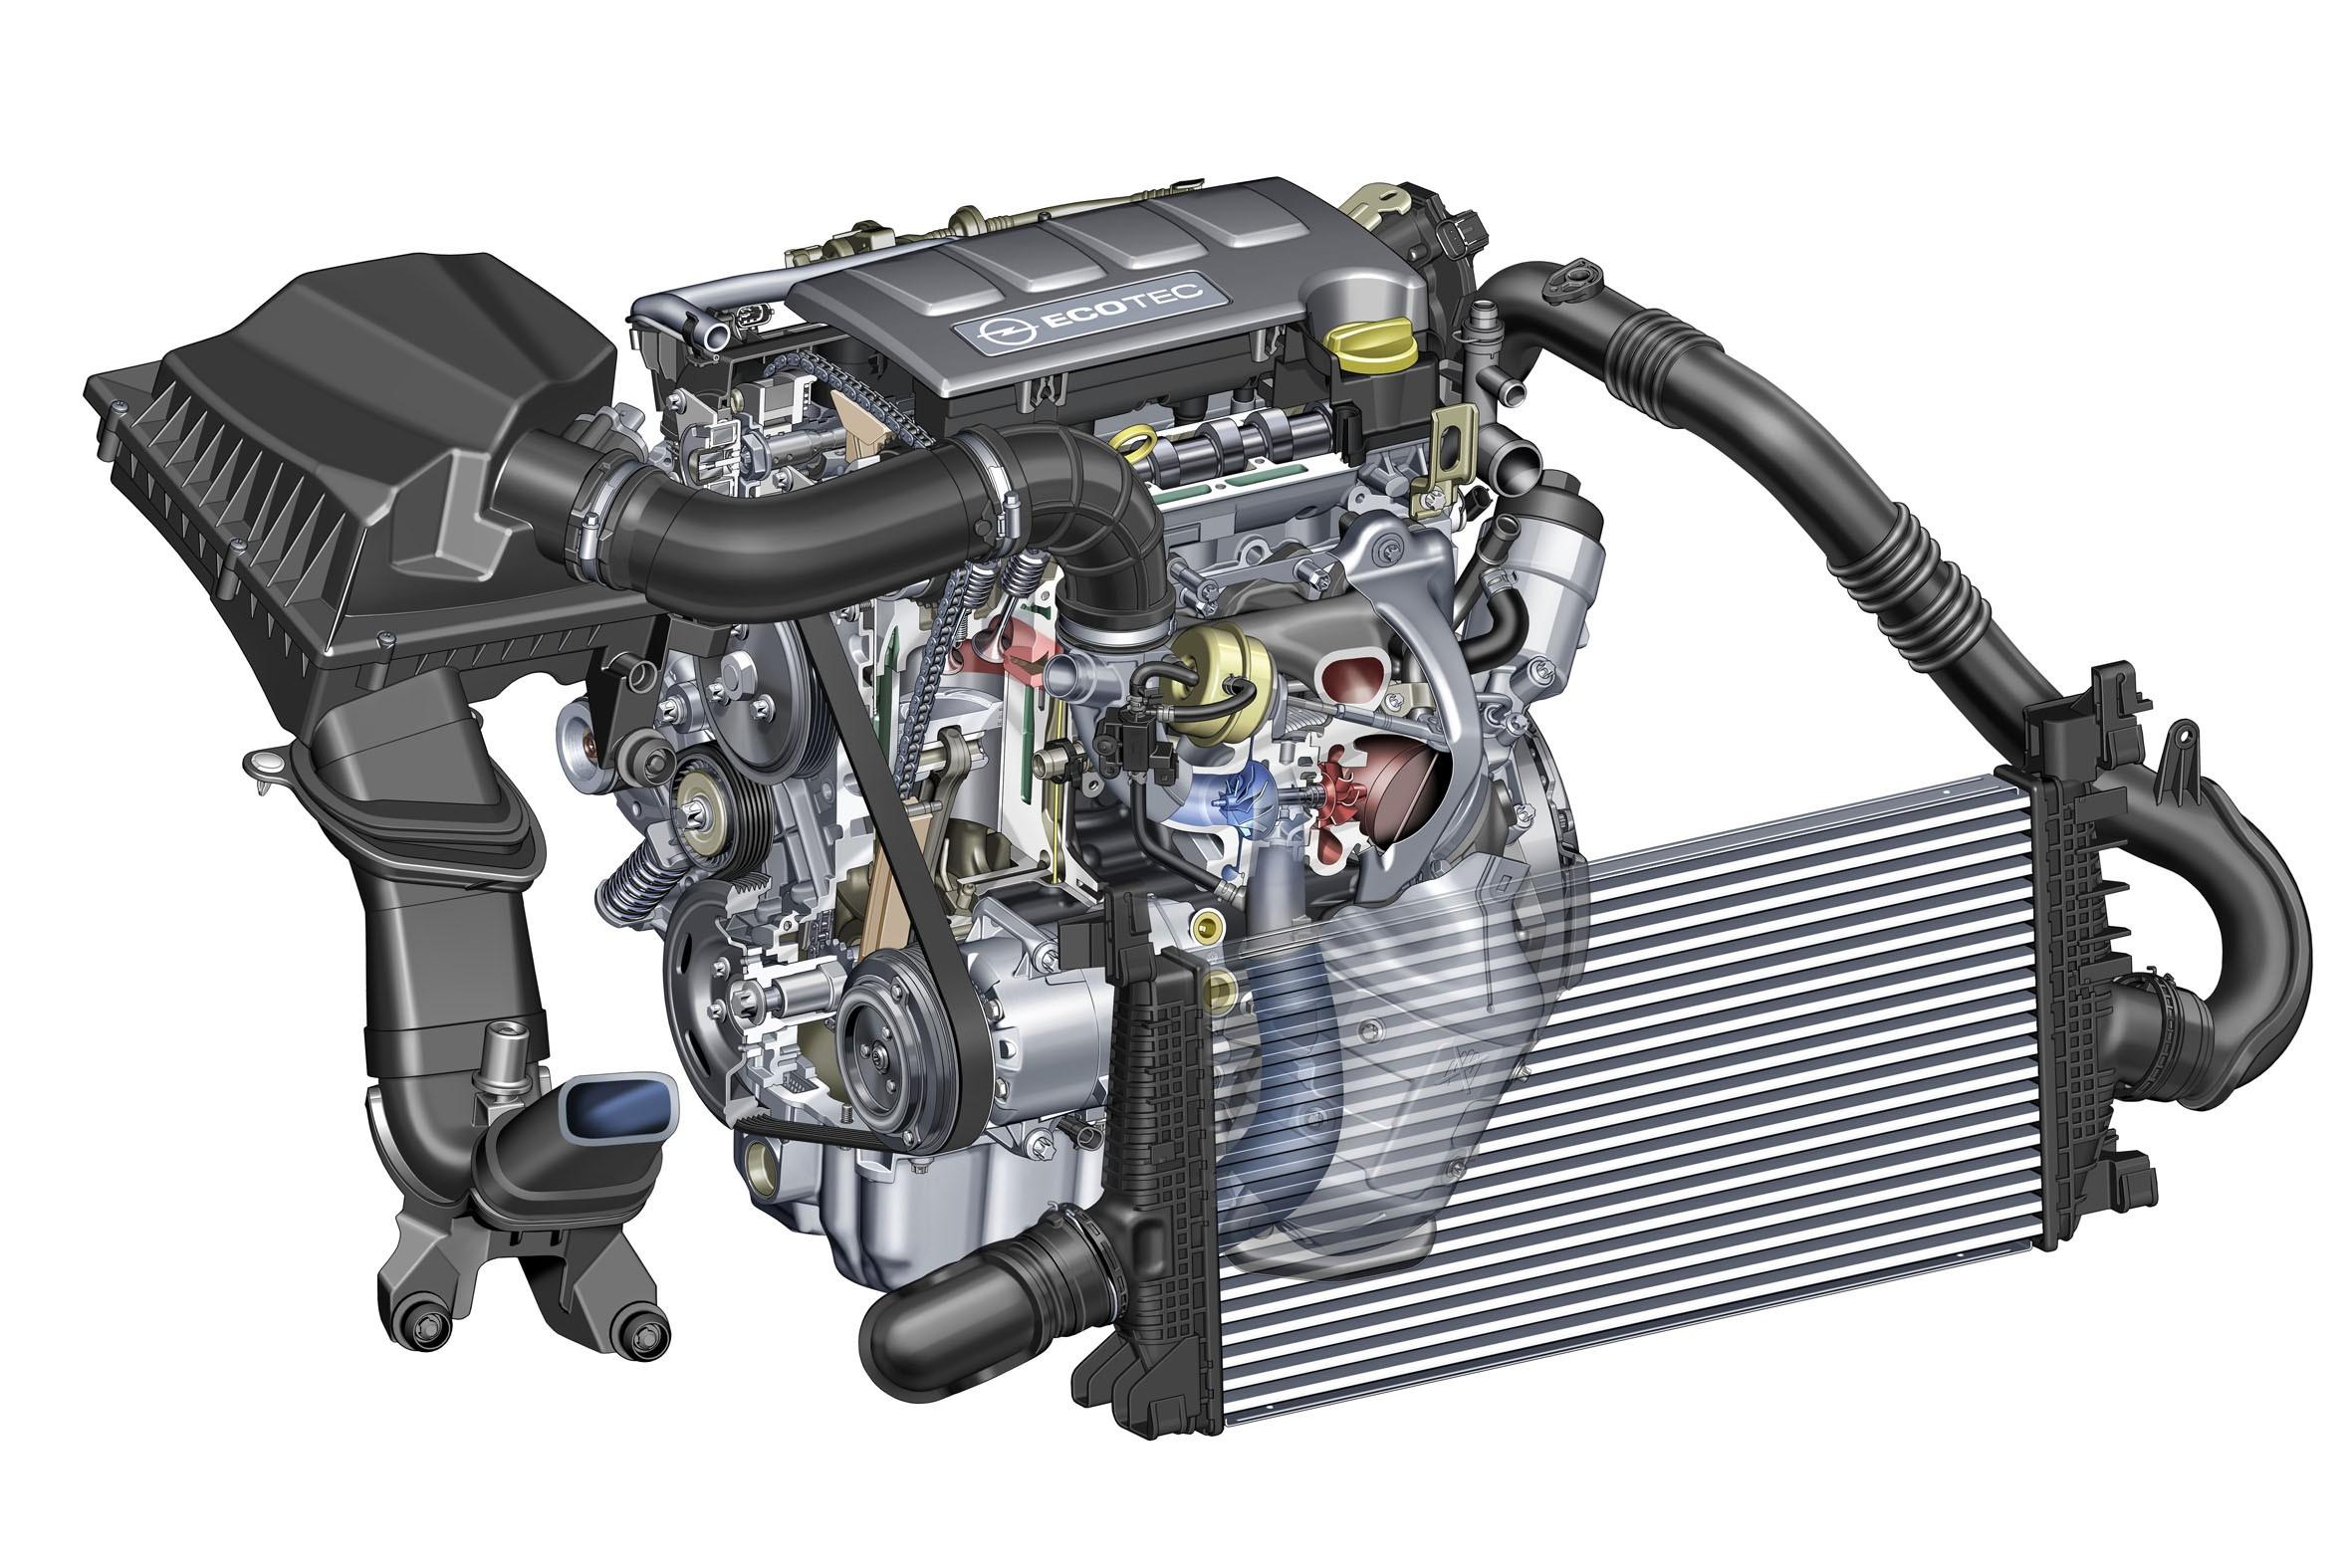 vauxhall corsa 1 2 engine diagram opel pressroom europe photos my rh detoxicrecenze com